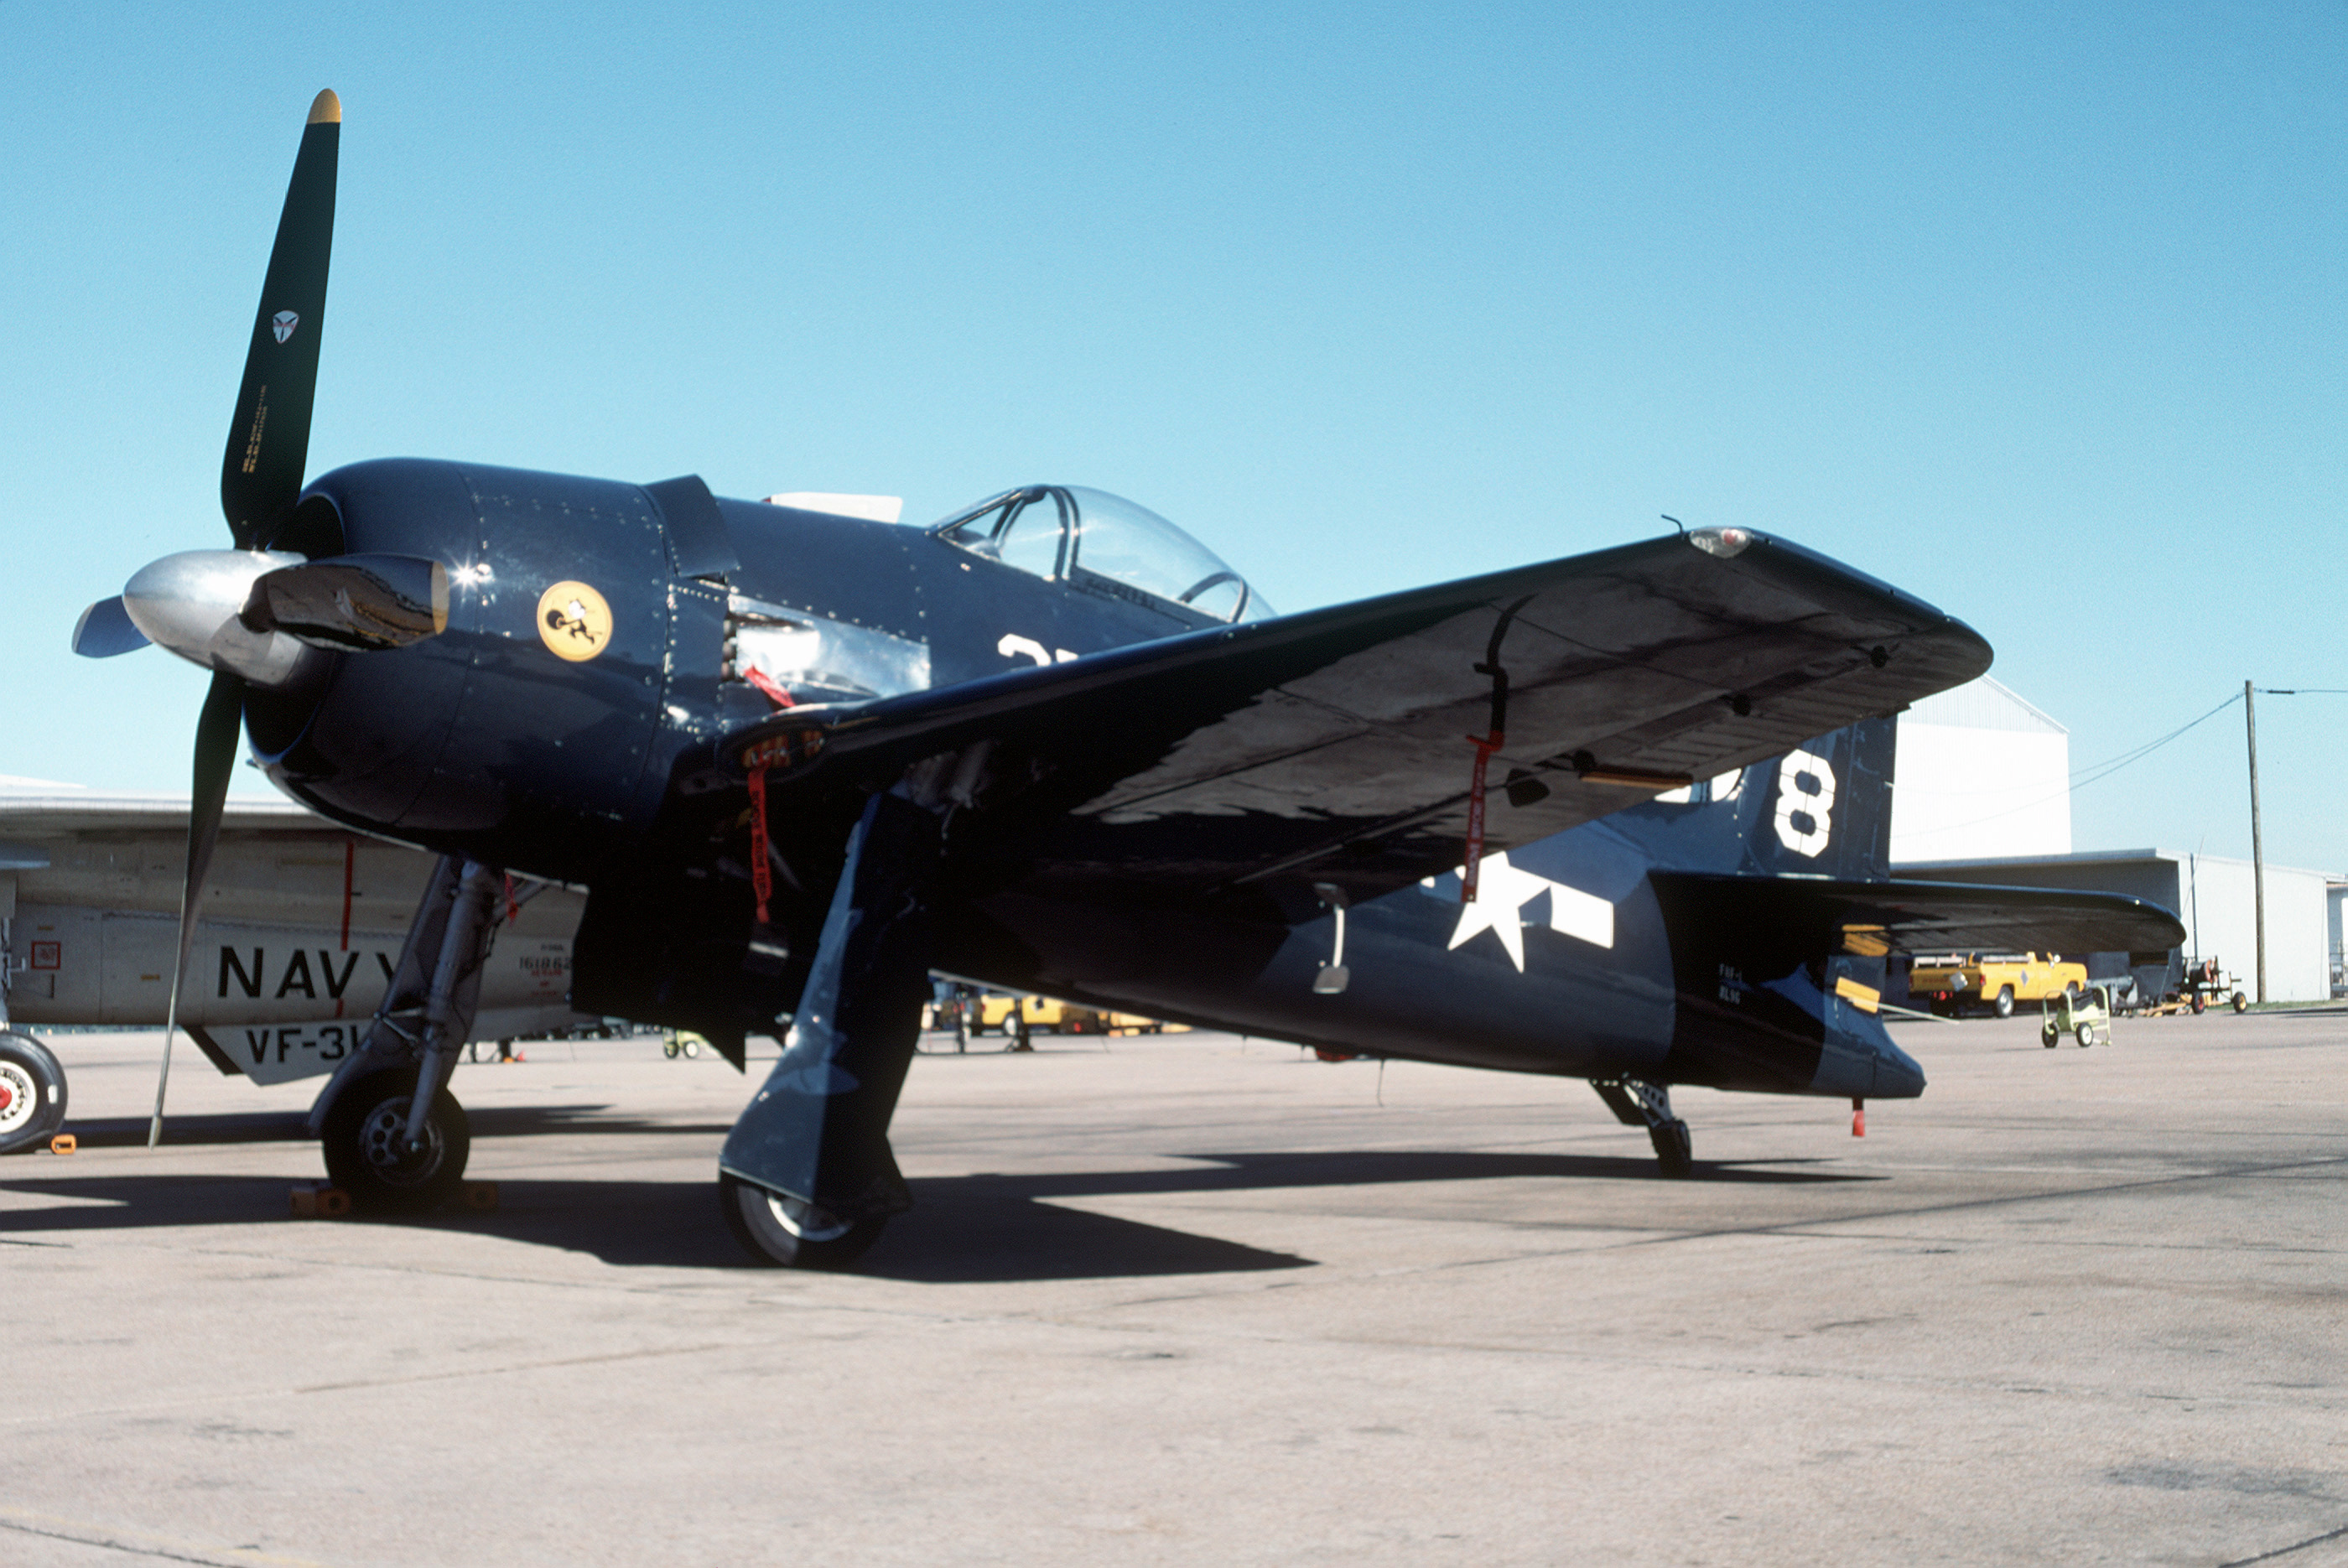 F8F (航空機)の画像 p1_40